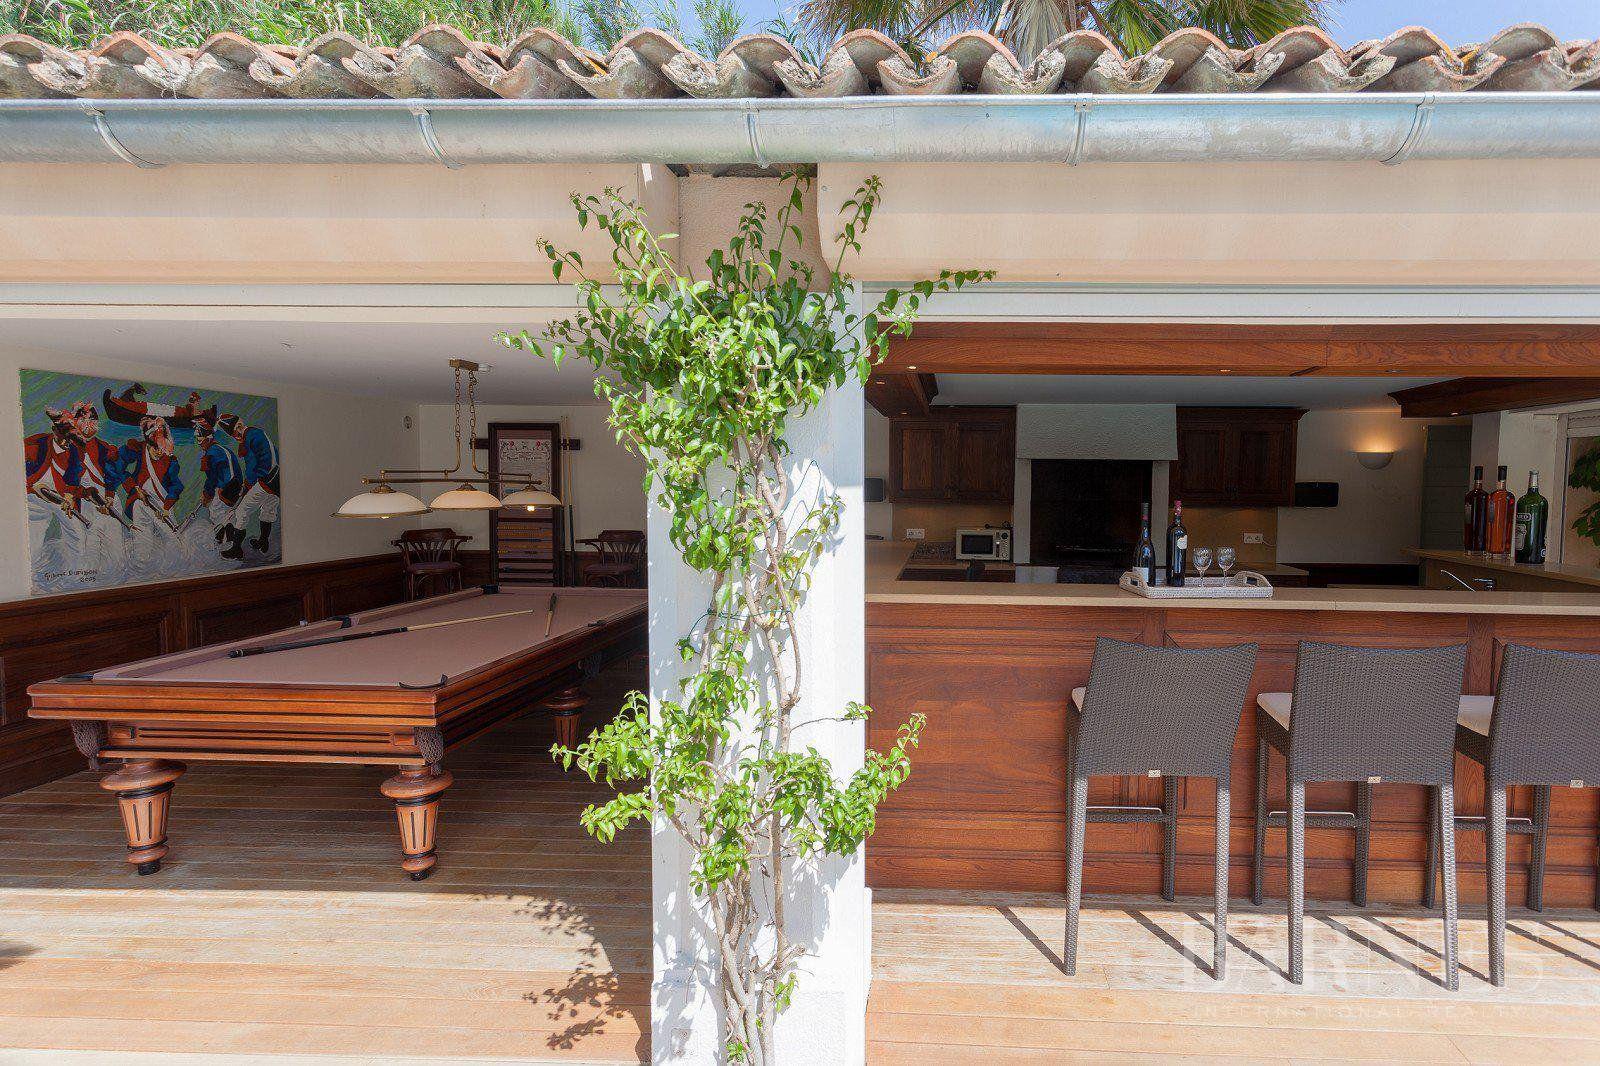 SAINT-TROPEZ - Charming villa with pool on the beach